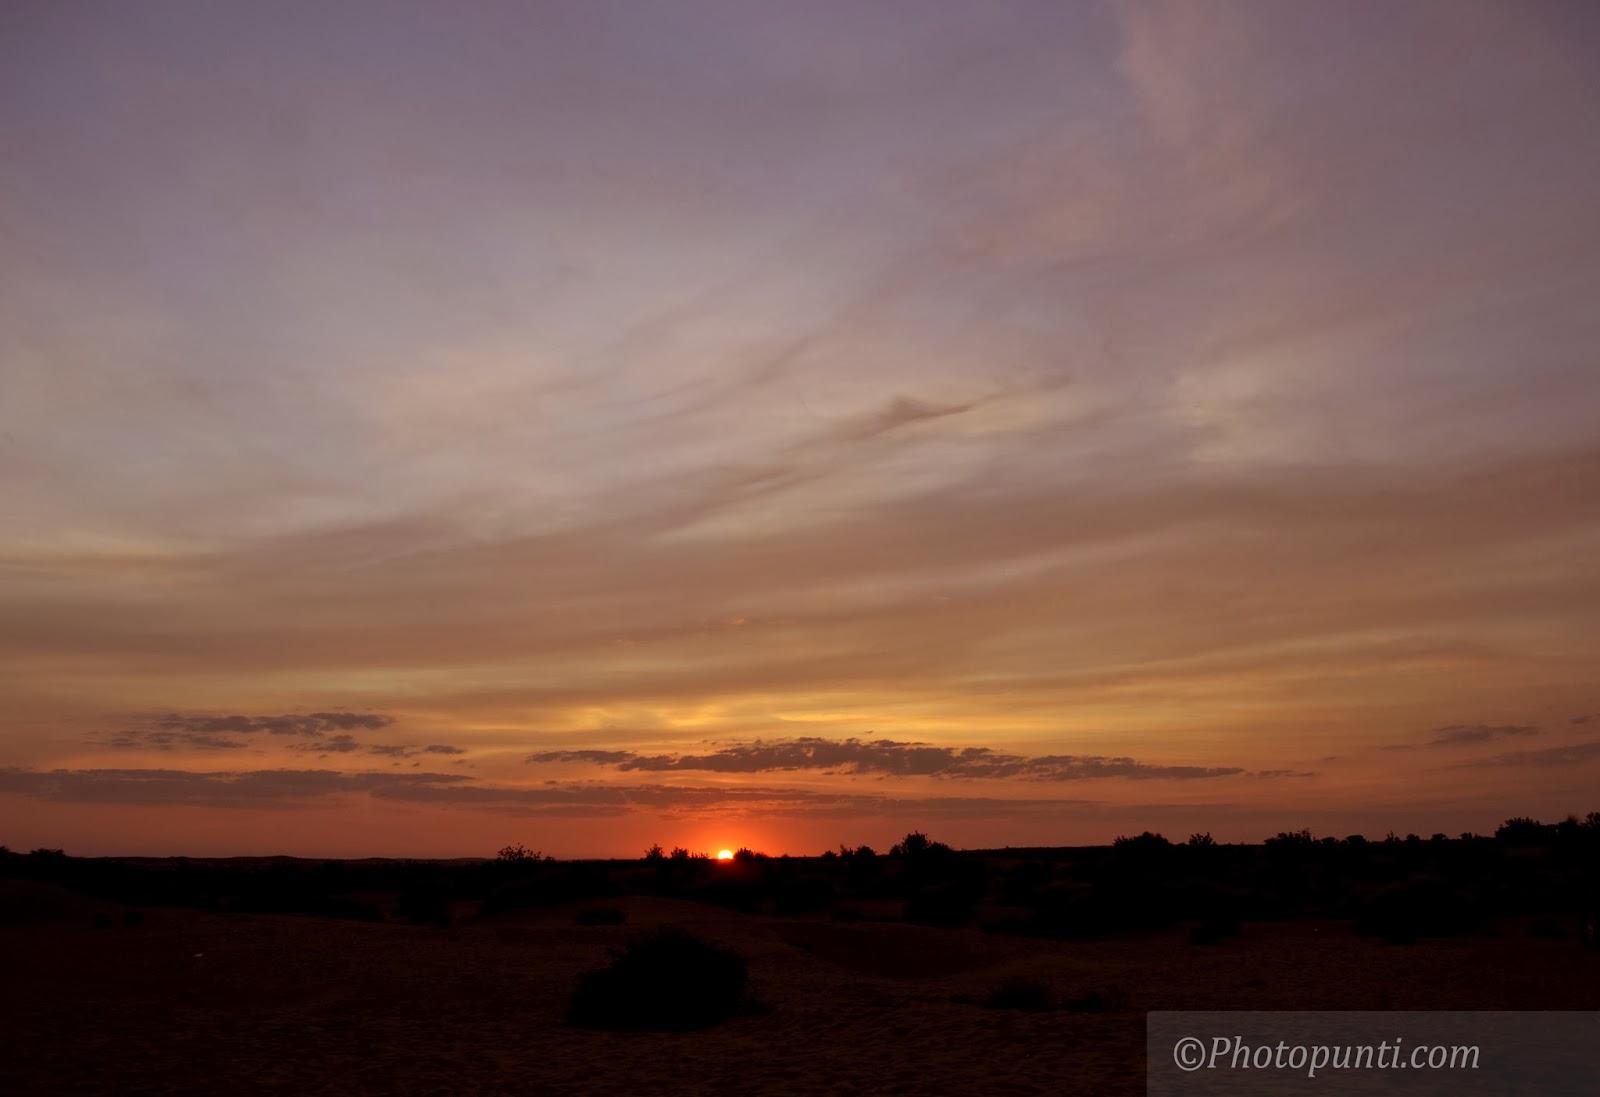 http://www.photopunti.com/2014/02/desert-sunset.html